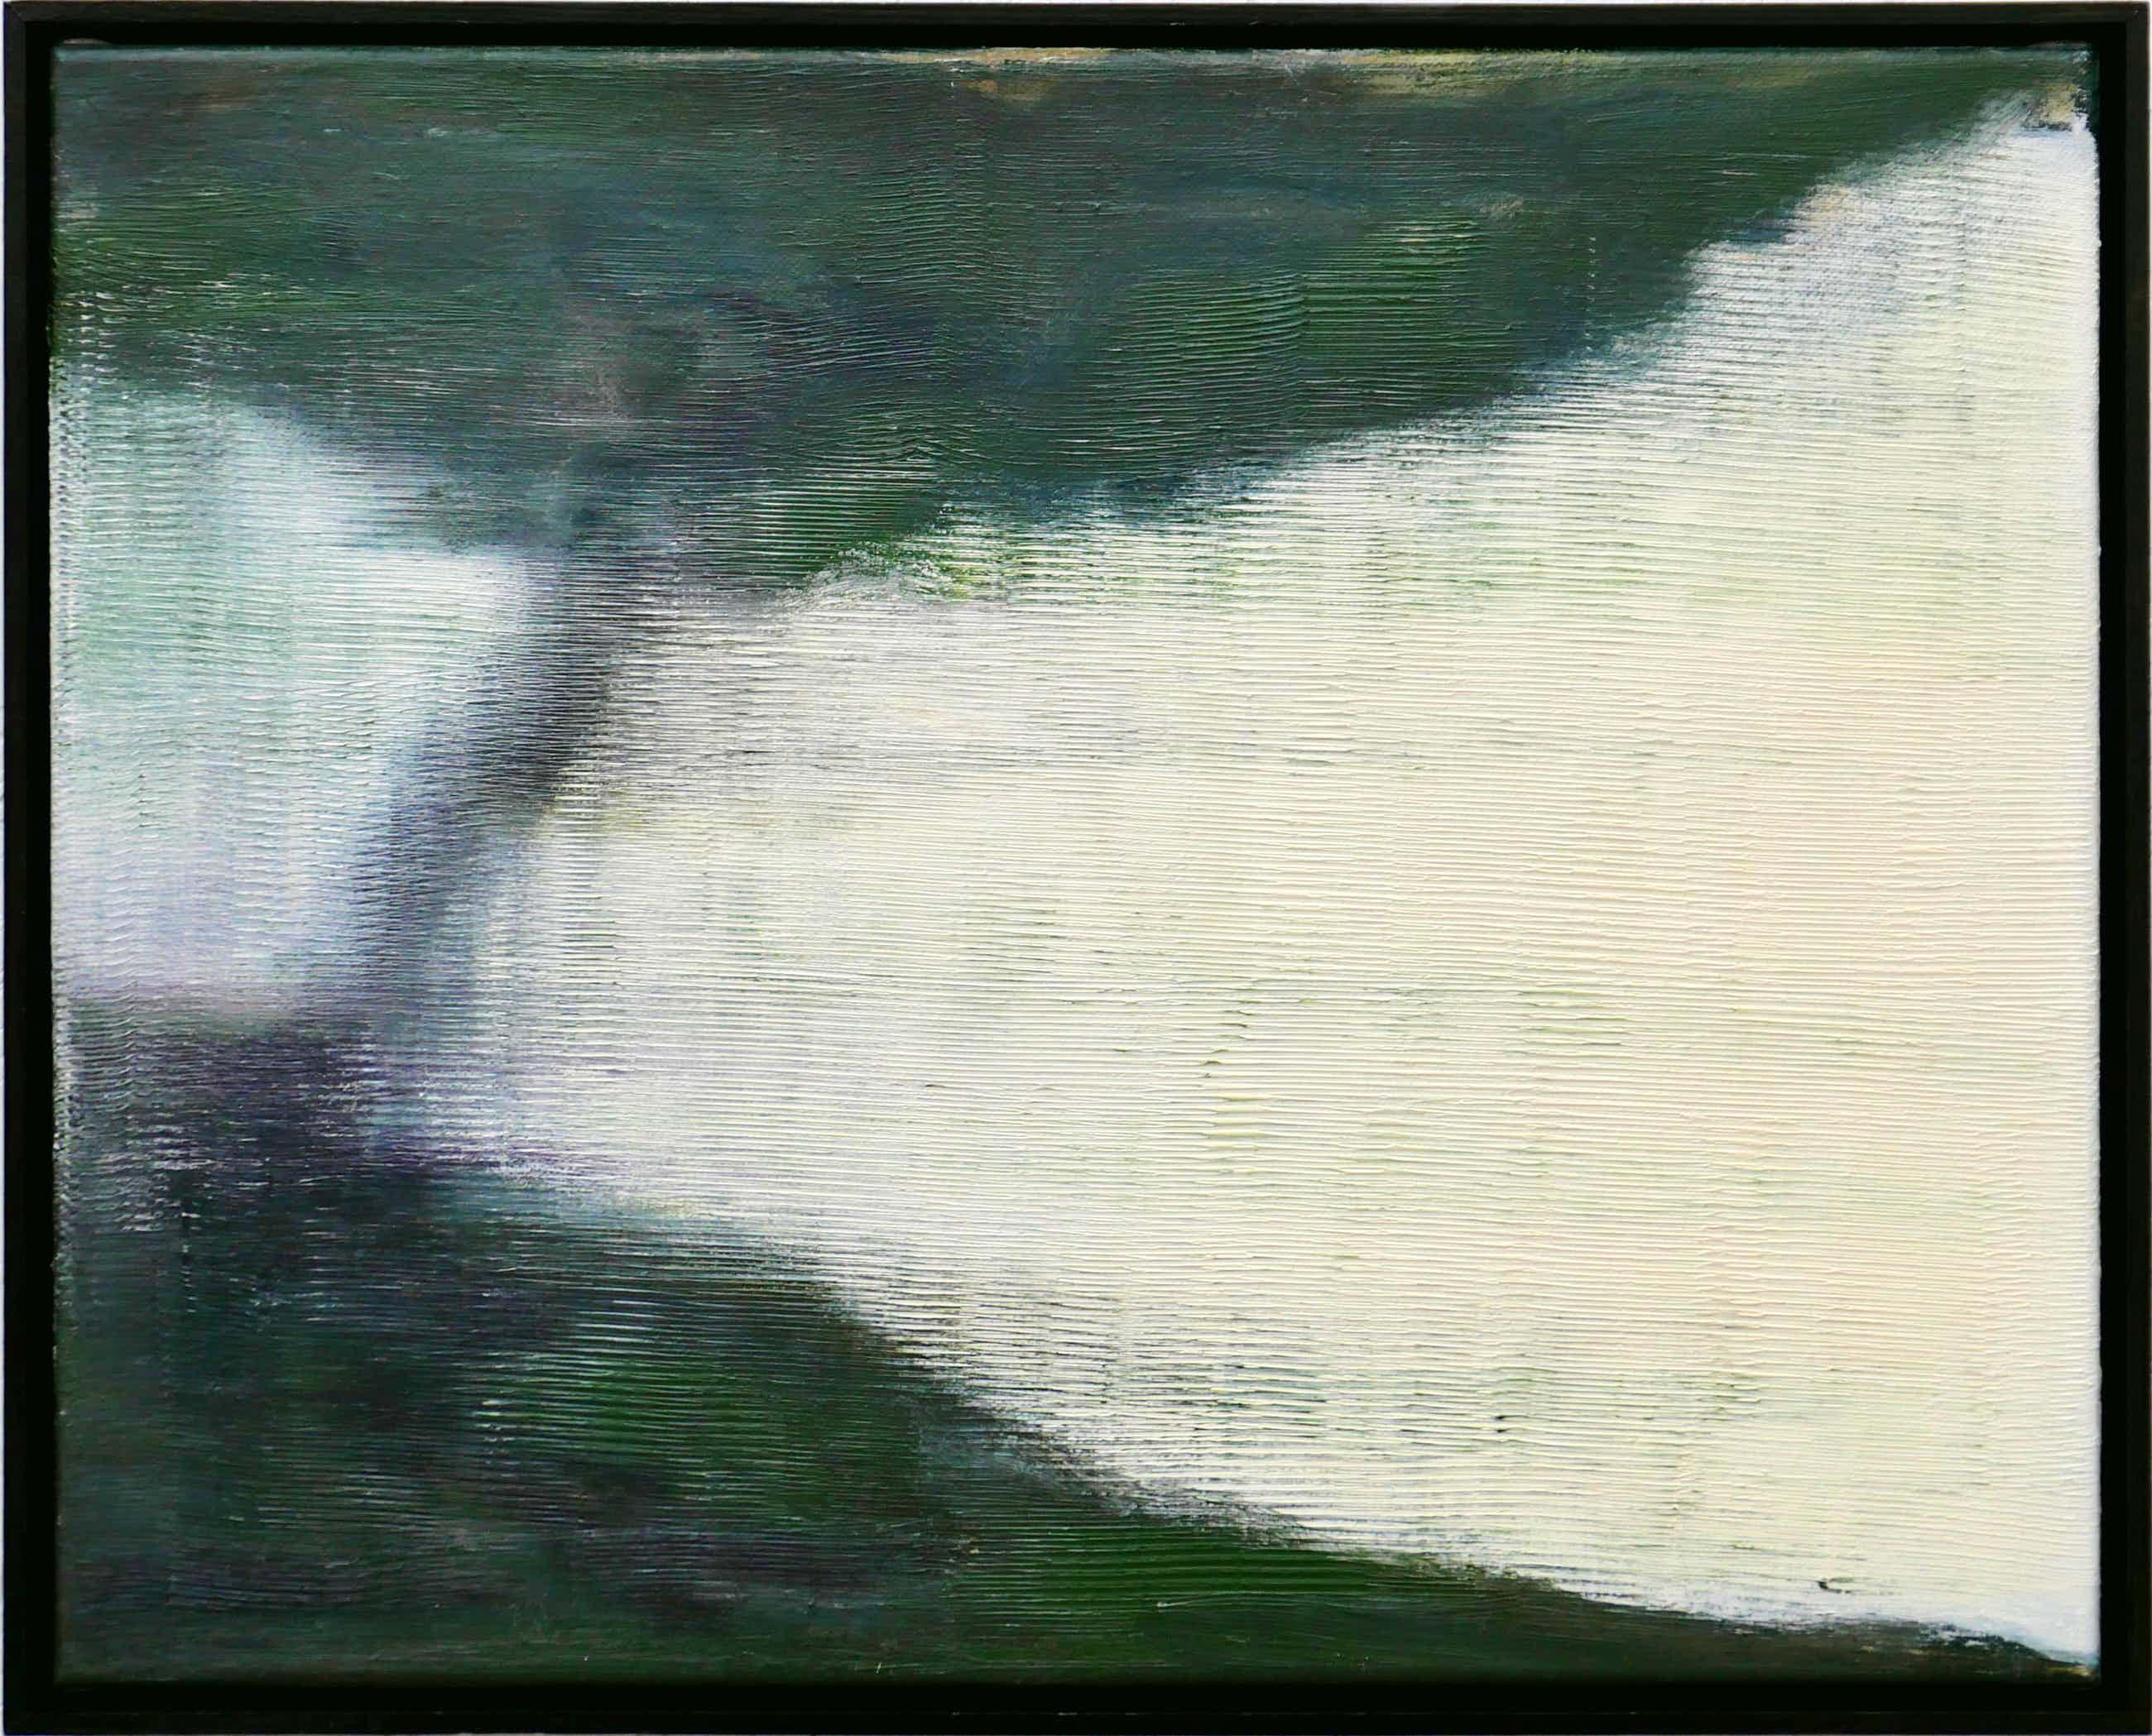 Paul Corvers - Foggy Forest (583) kopen? Bied vanaf 271!